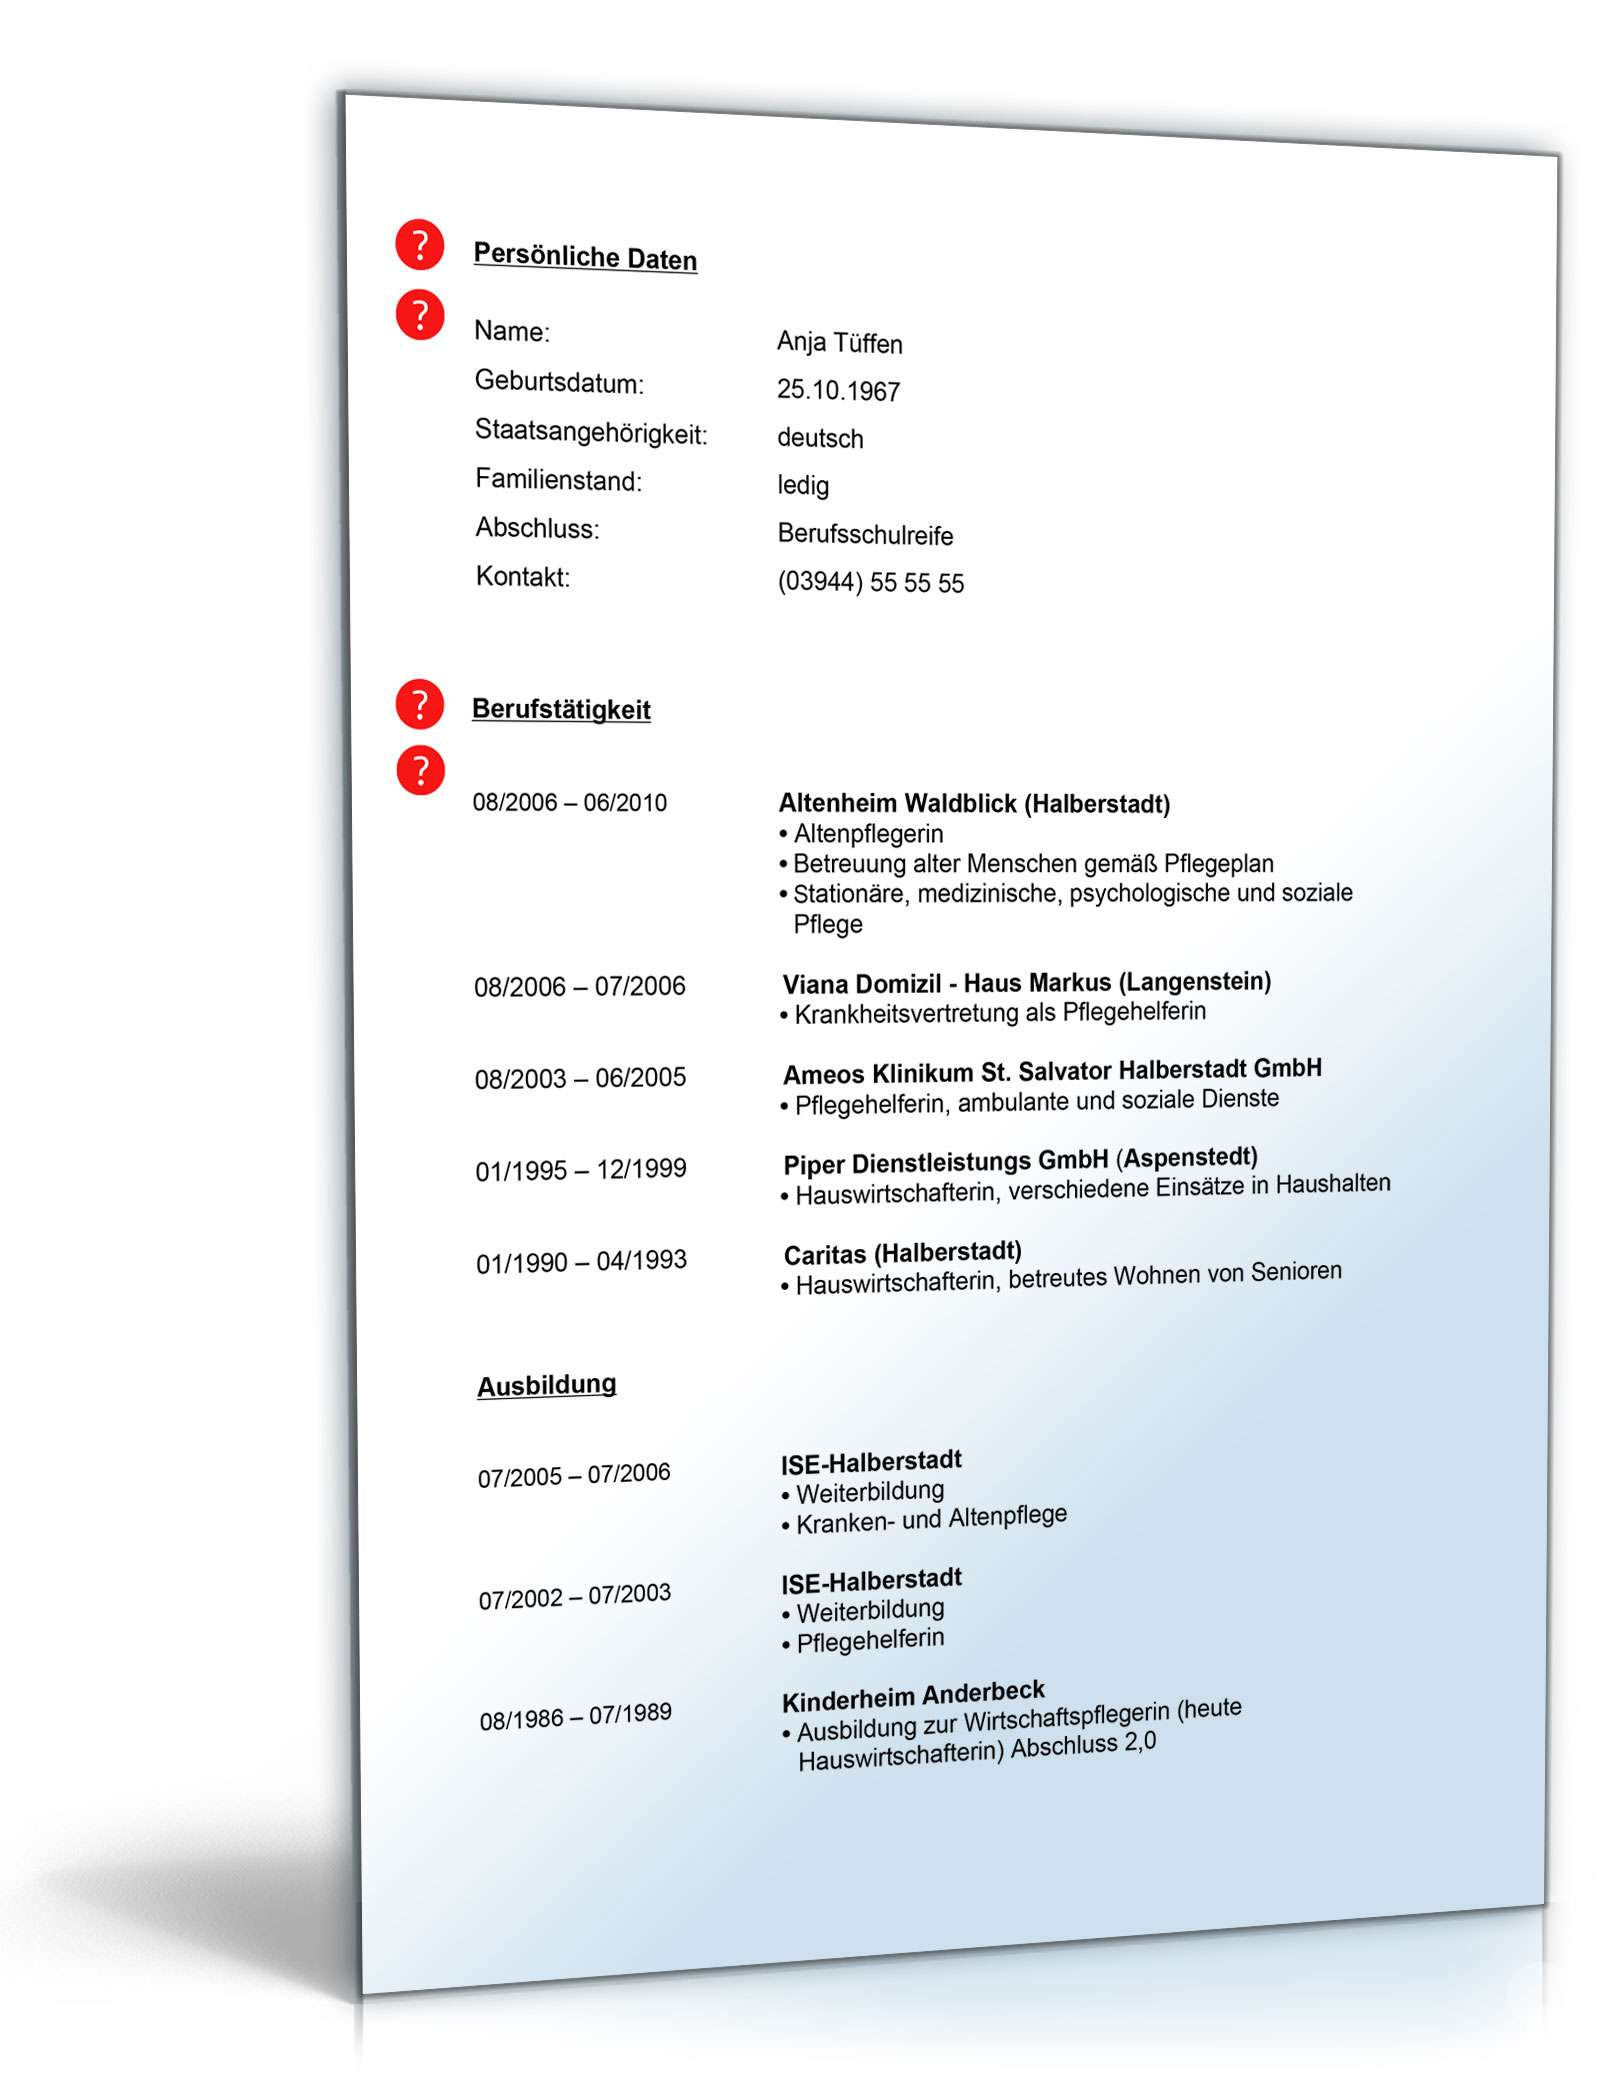 Charmant Lebenslaufvorlage Drucken Fotos - Entry Level Resume ...